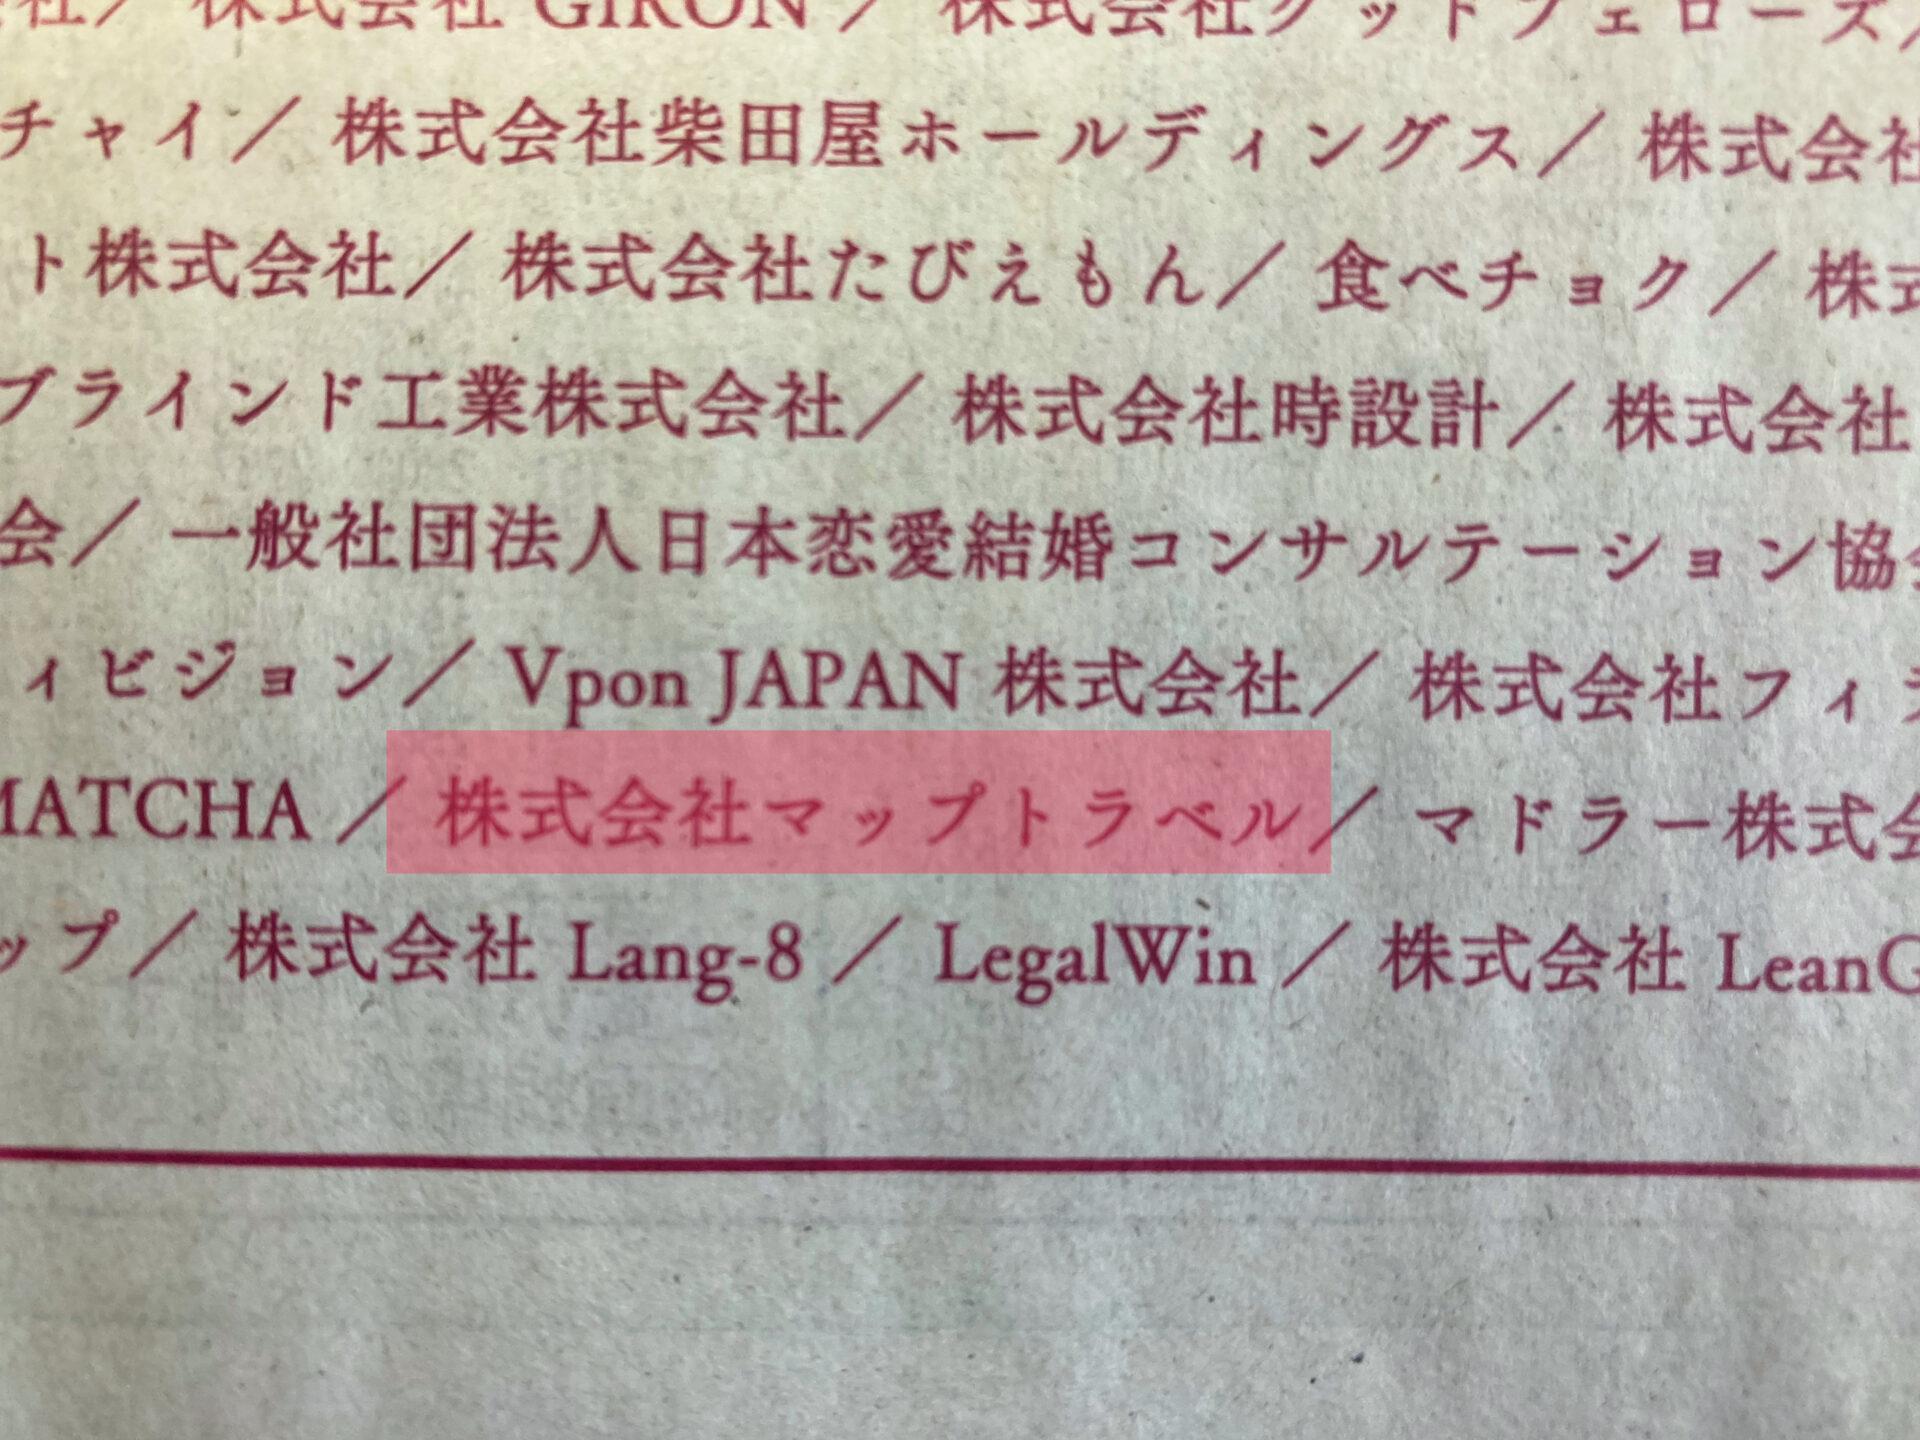 PR TIMES_日経新聞朝刊(全国版)20210225_写真3